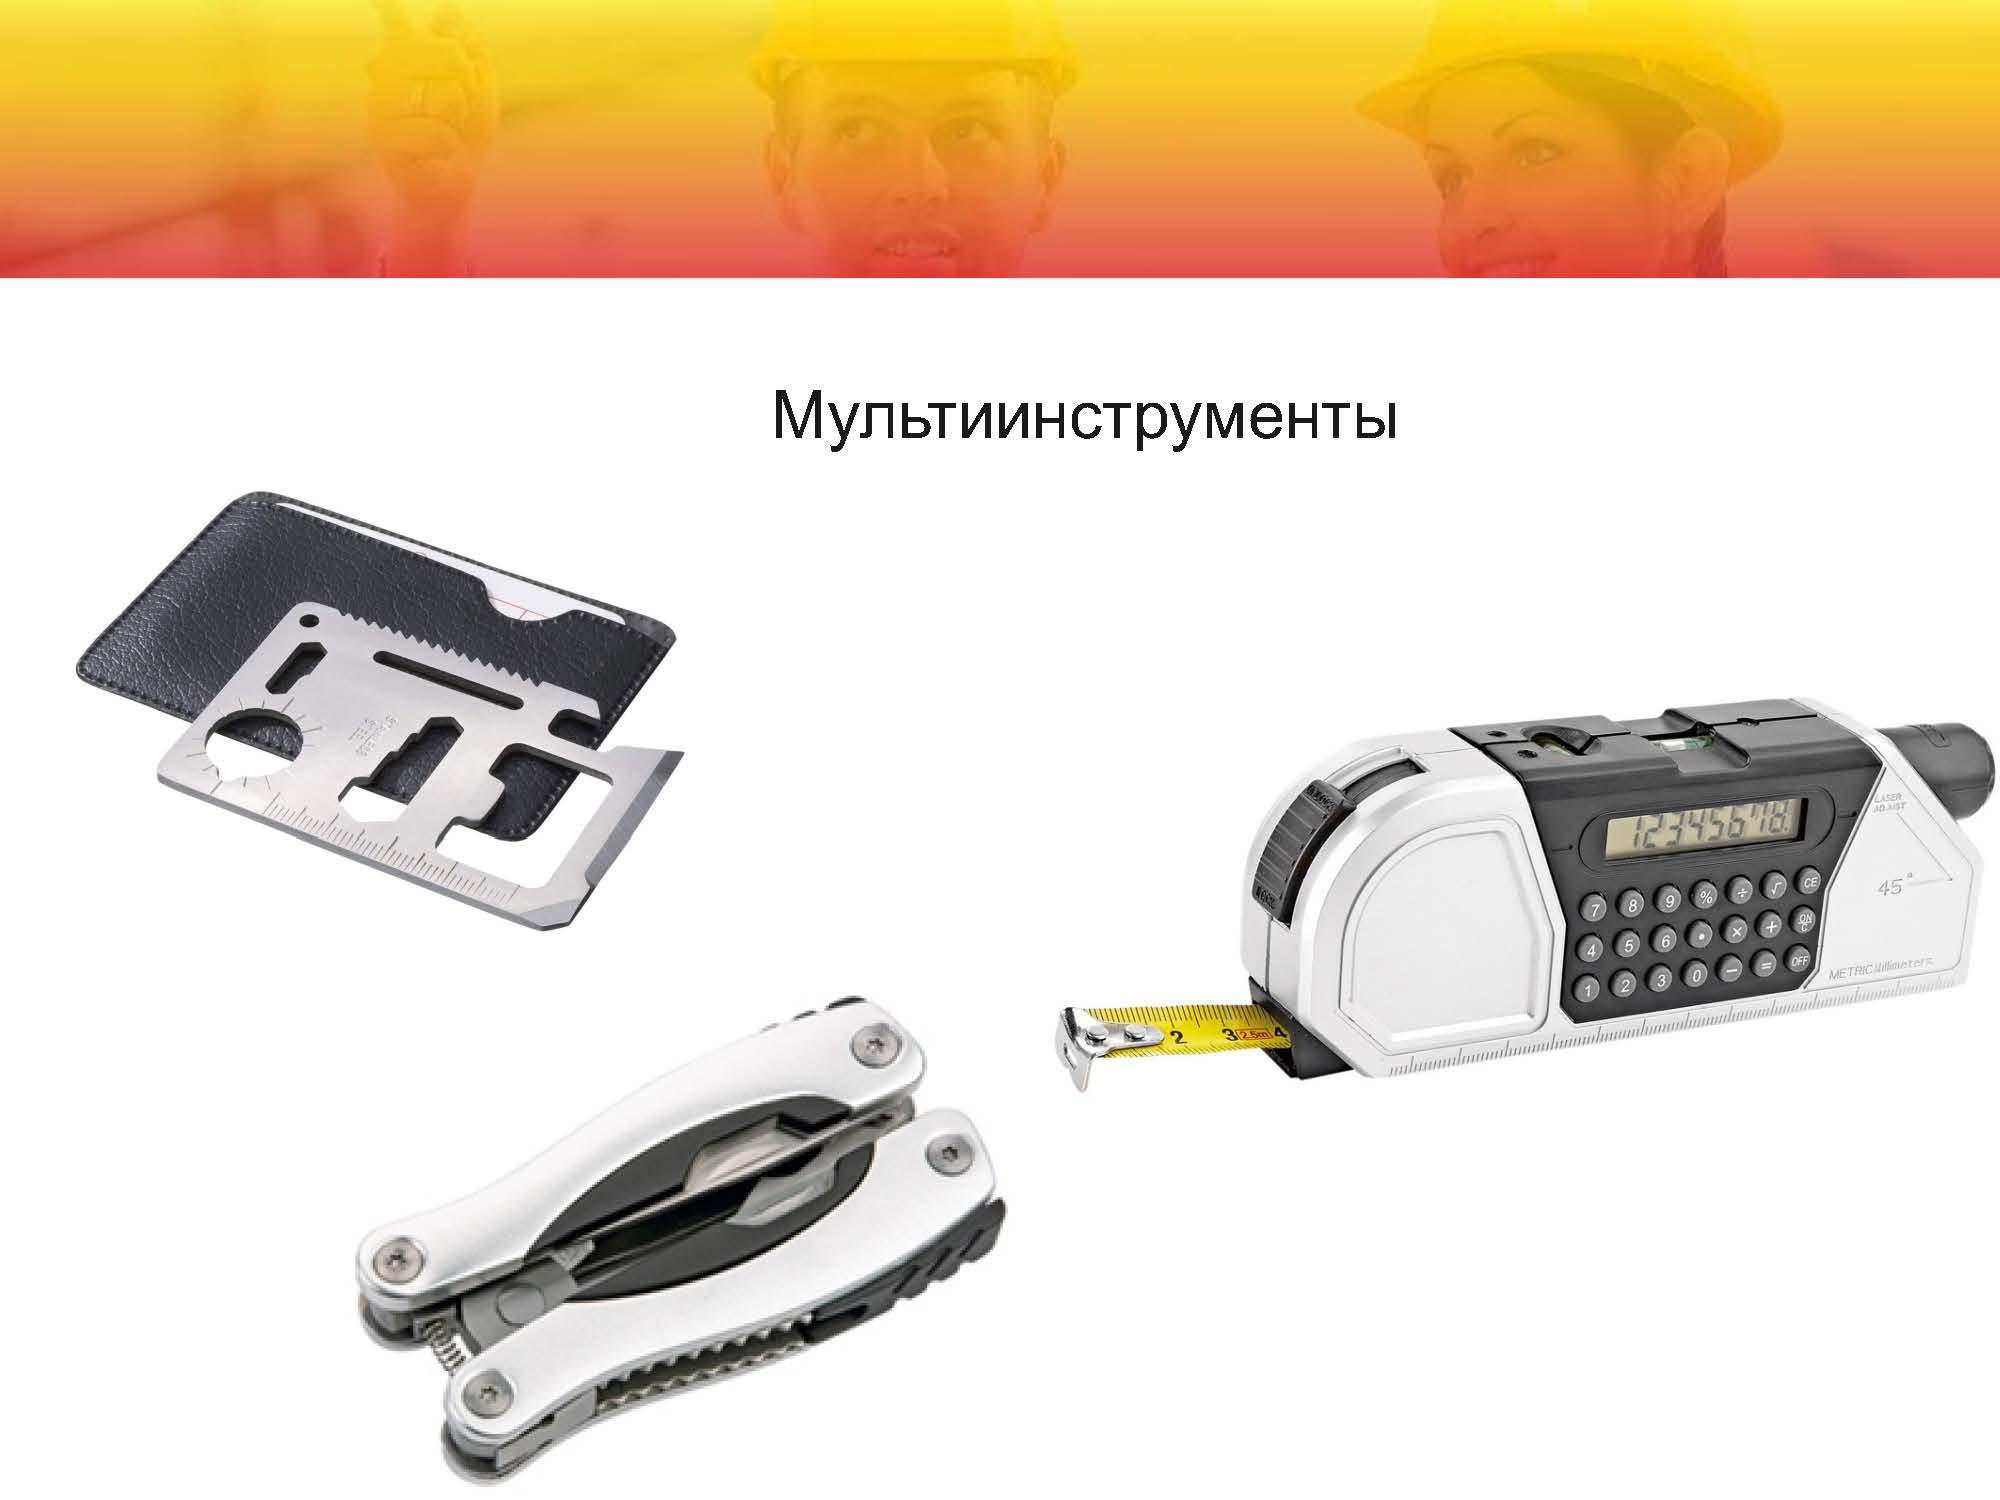 Презентация от PromoPrime  День Строителя_Страница_09